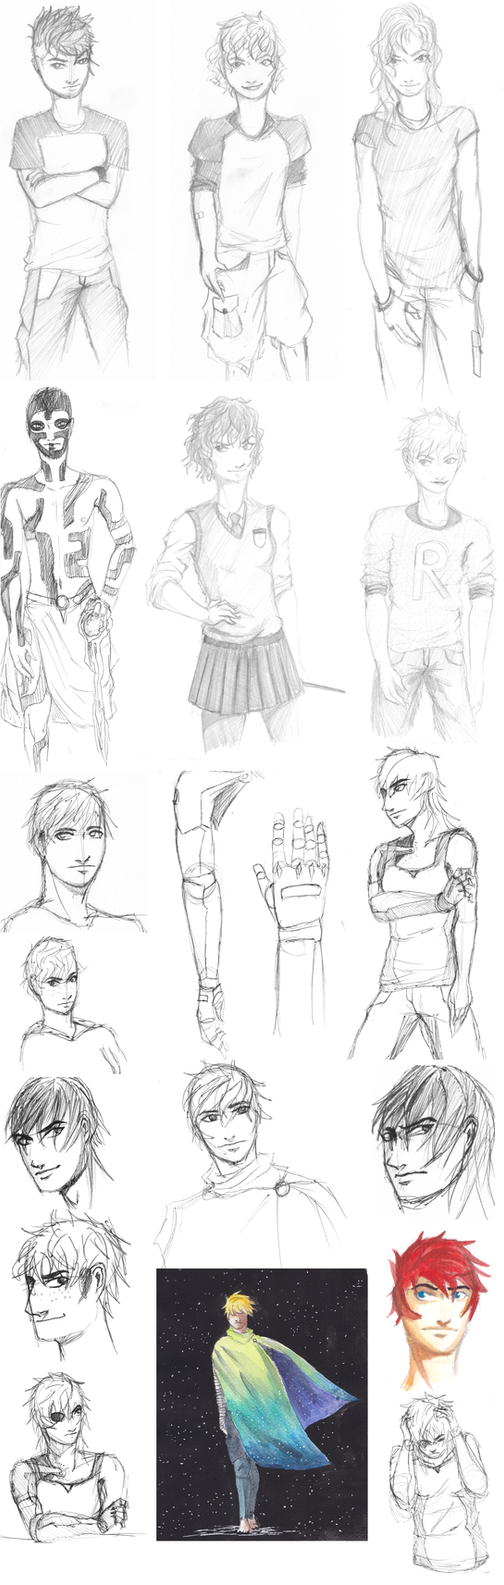 Sketchdump1 by crazy-fruit